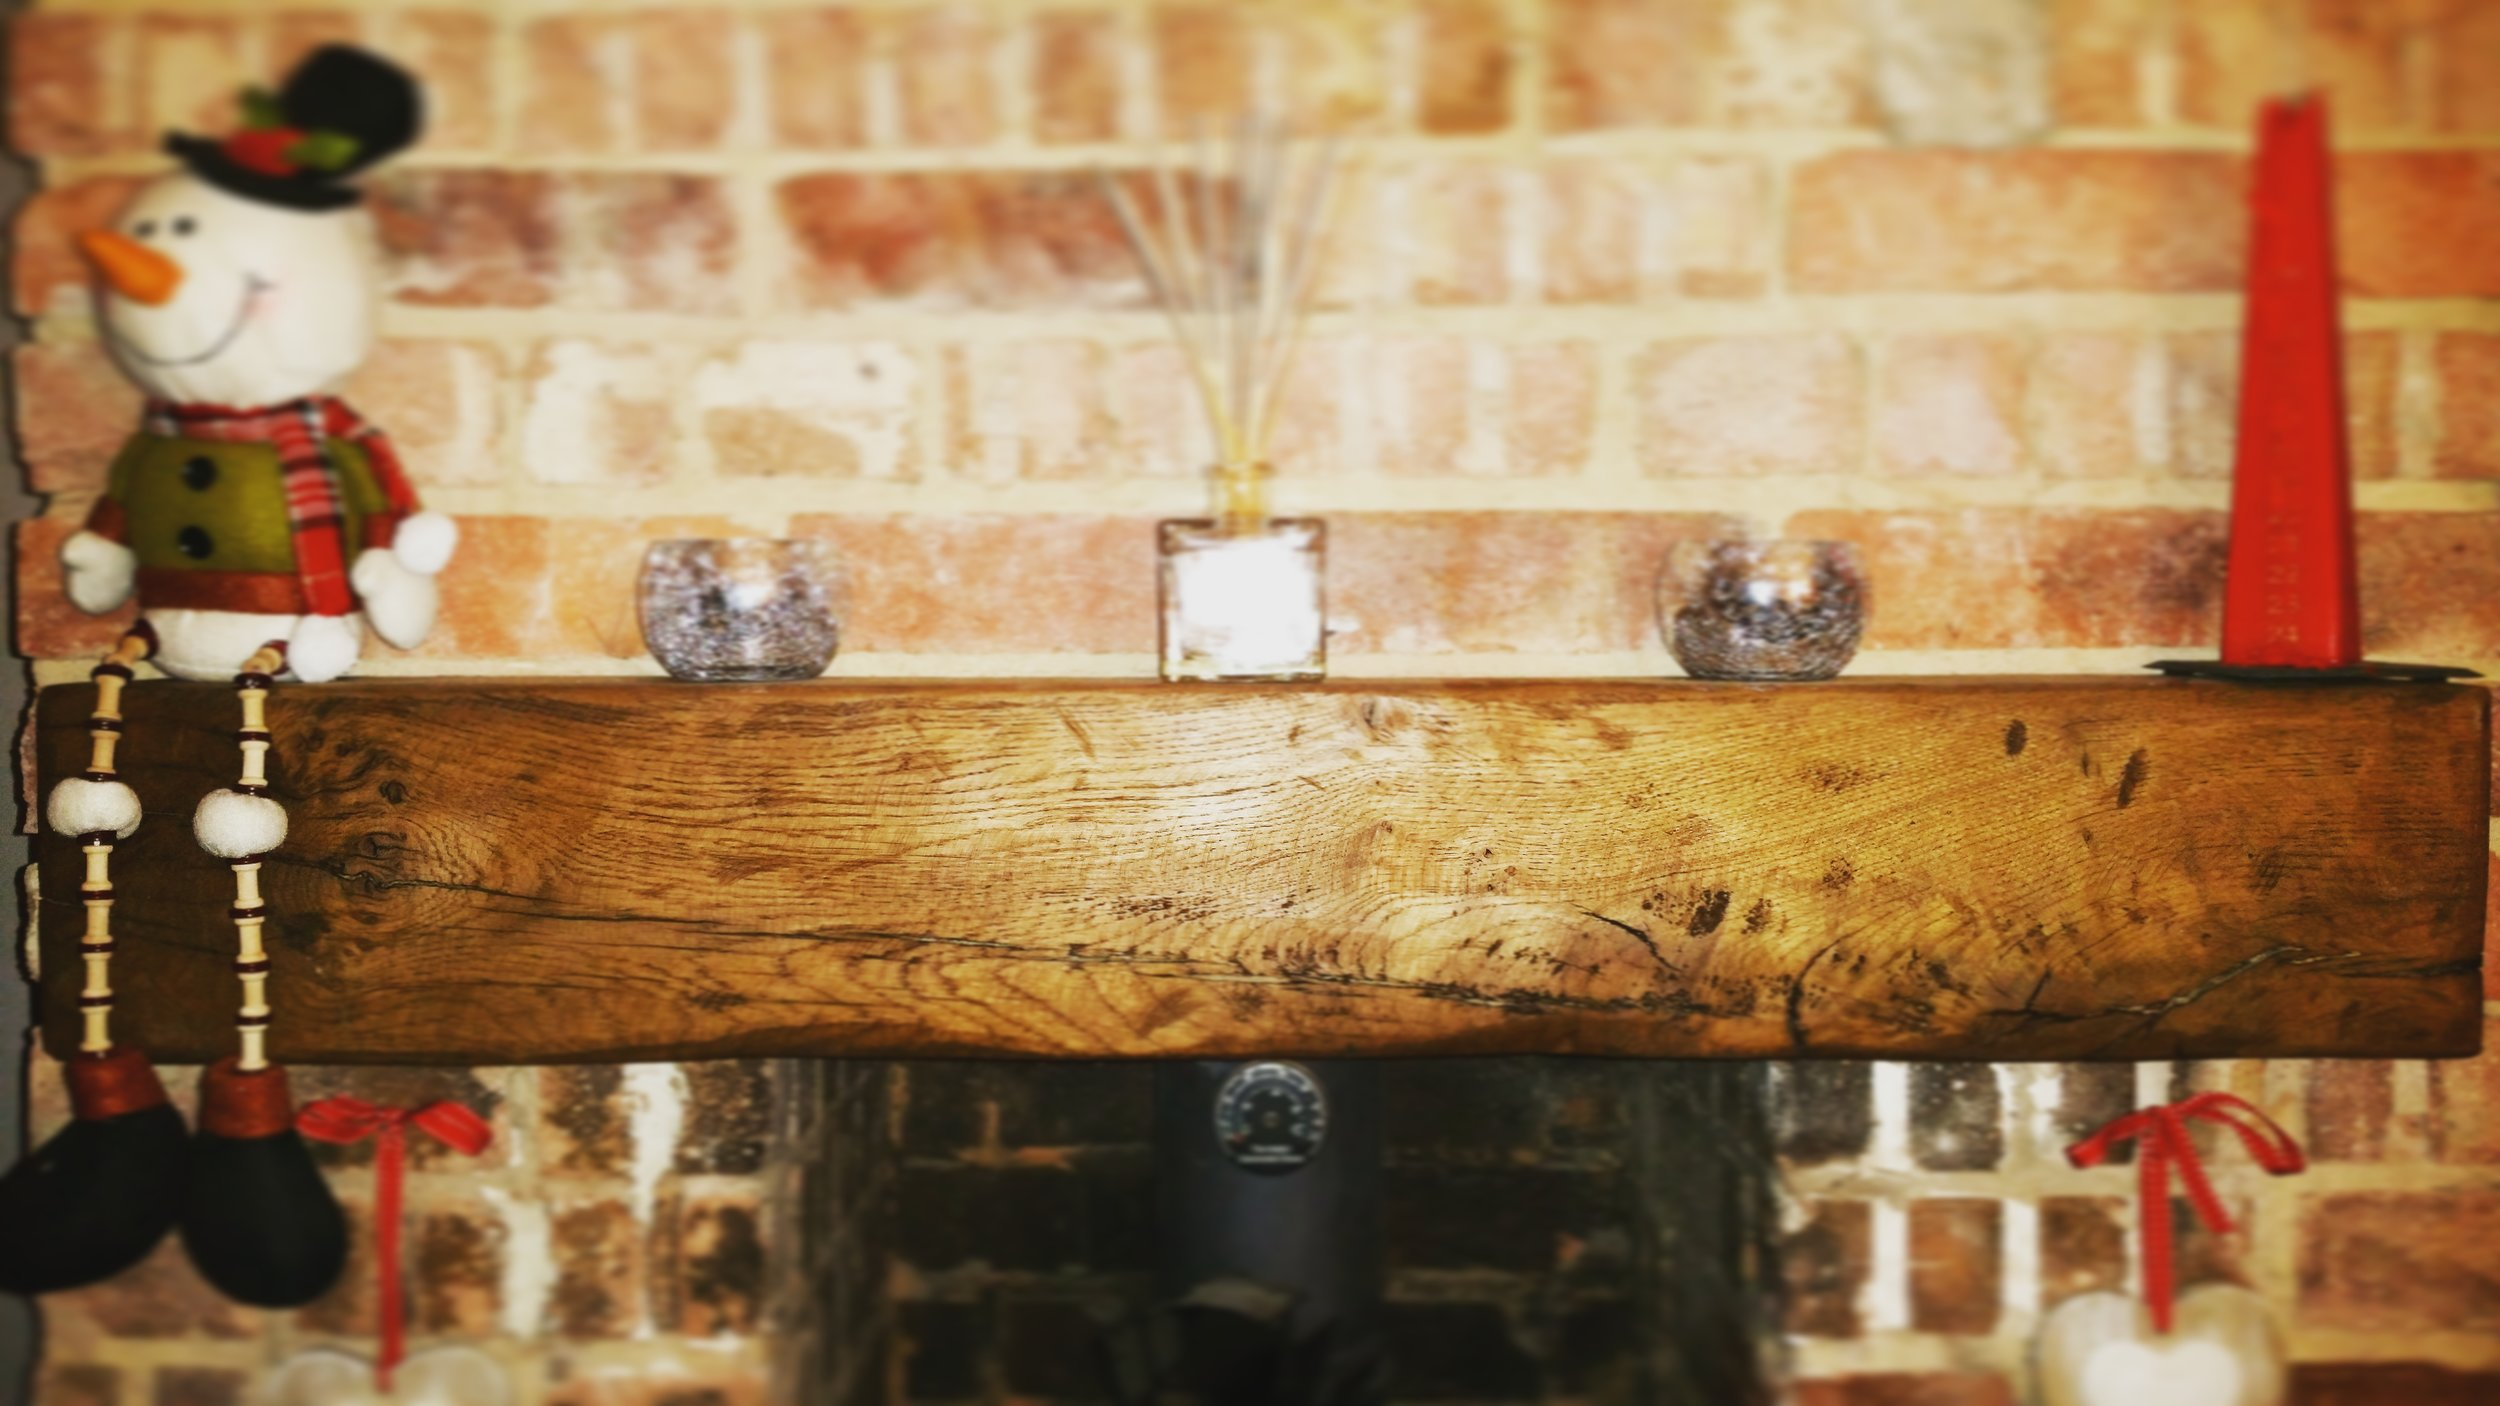 Stunning old rustic oak beam